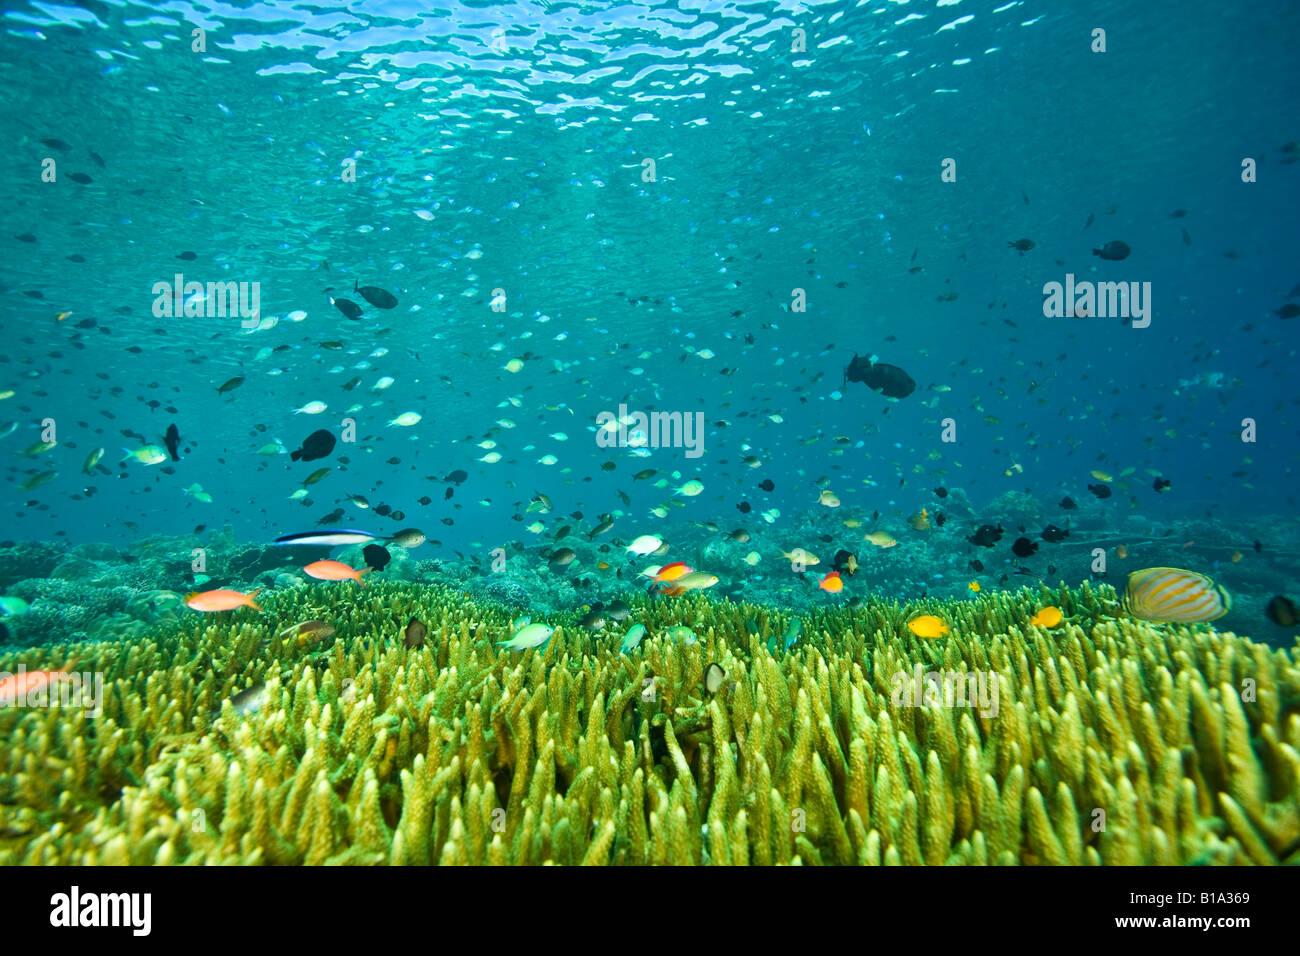 Schooling fish - Stock Image